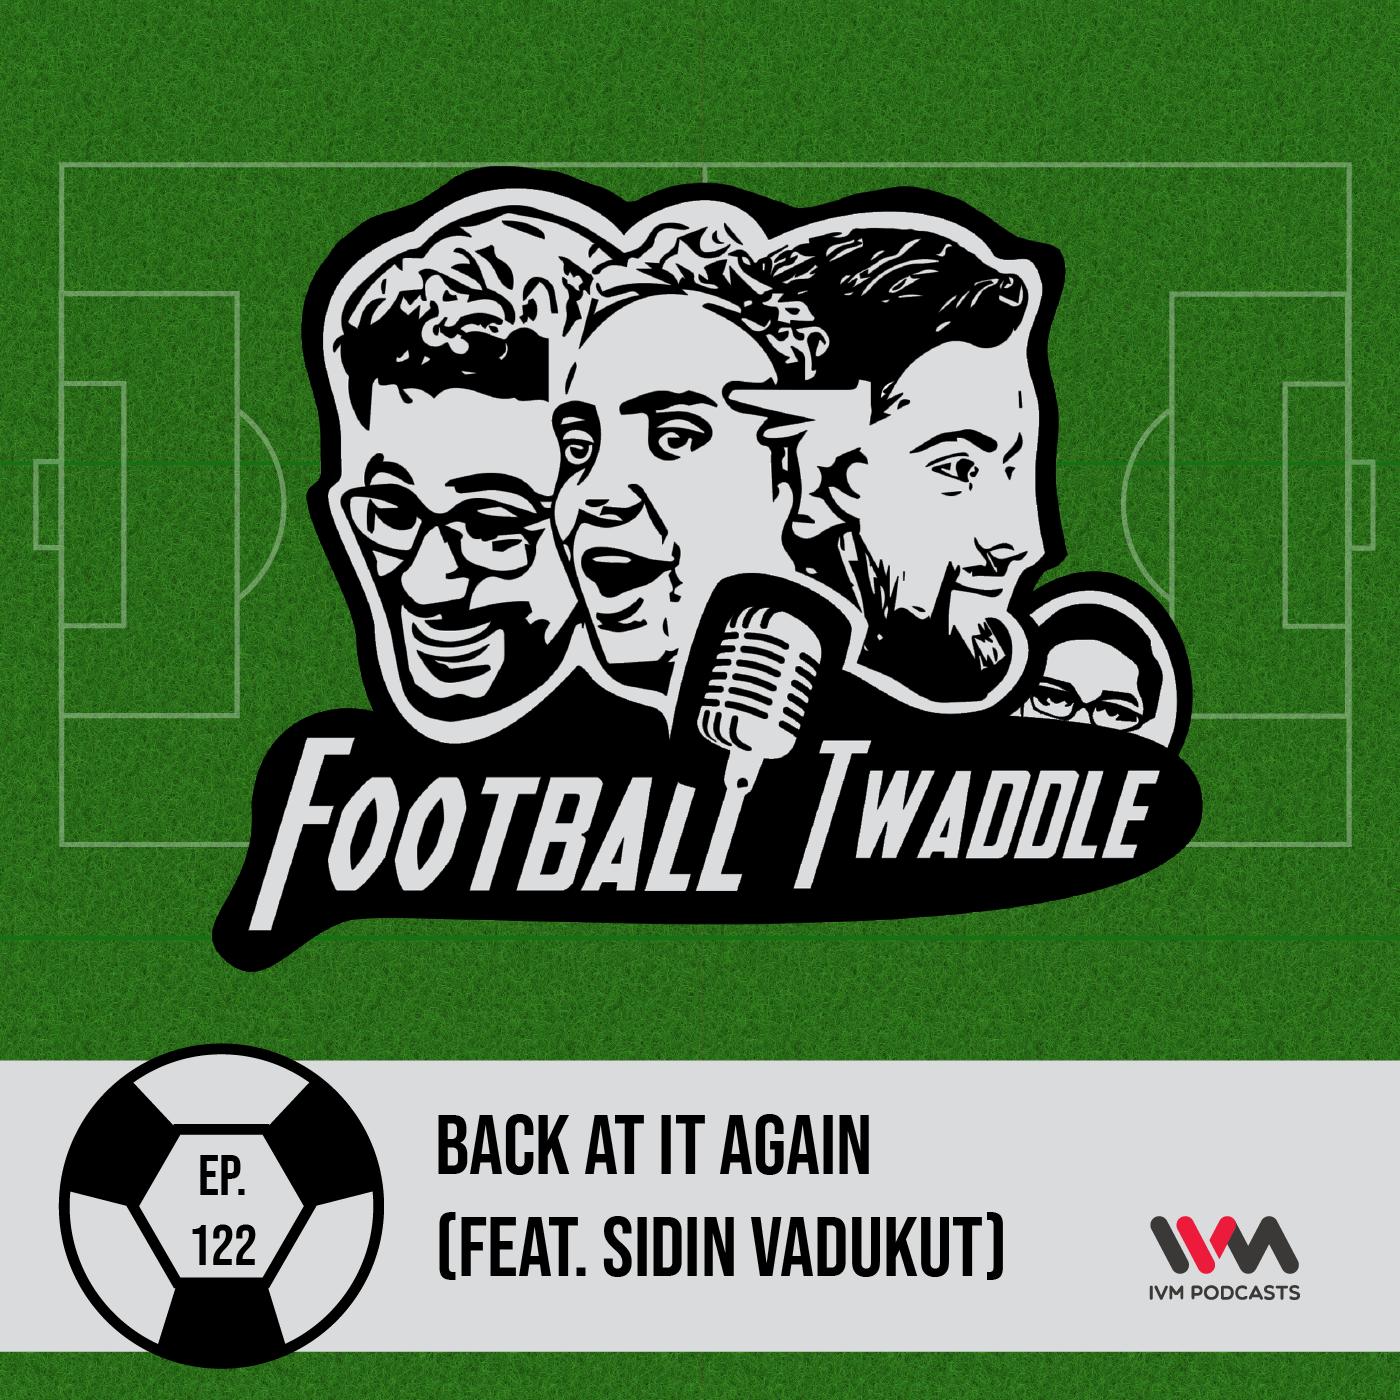 Football Twaddle: Back At It Again (Feat. Sidin Vadukut)